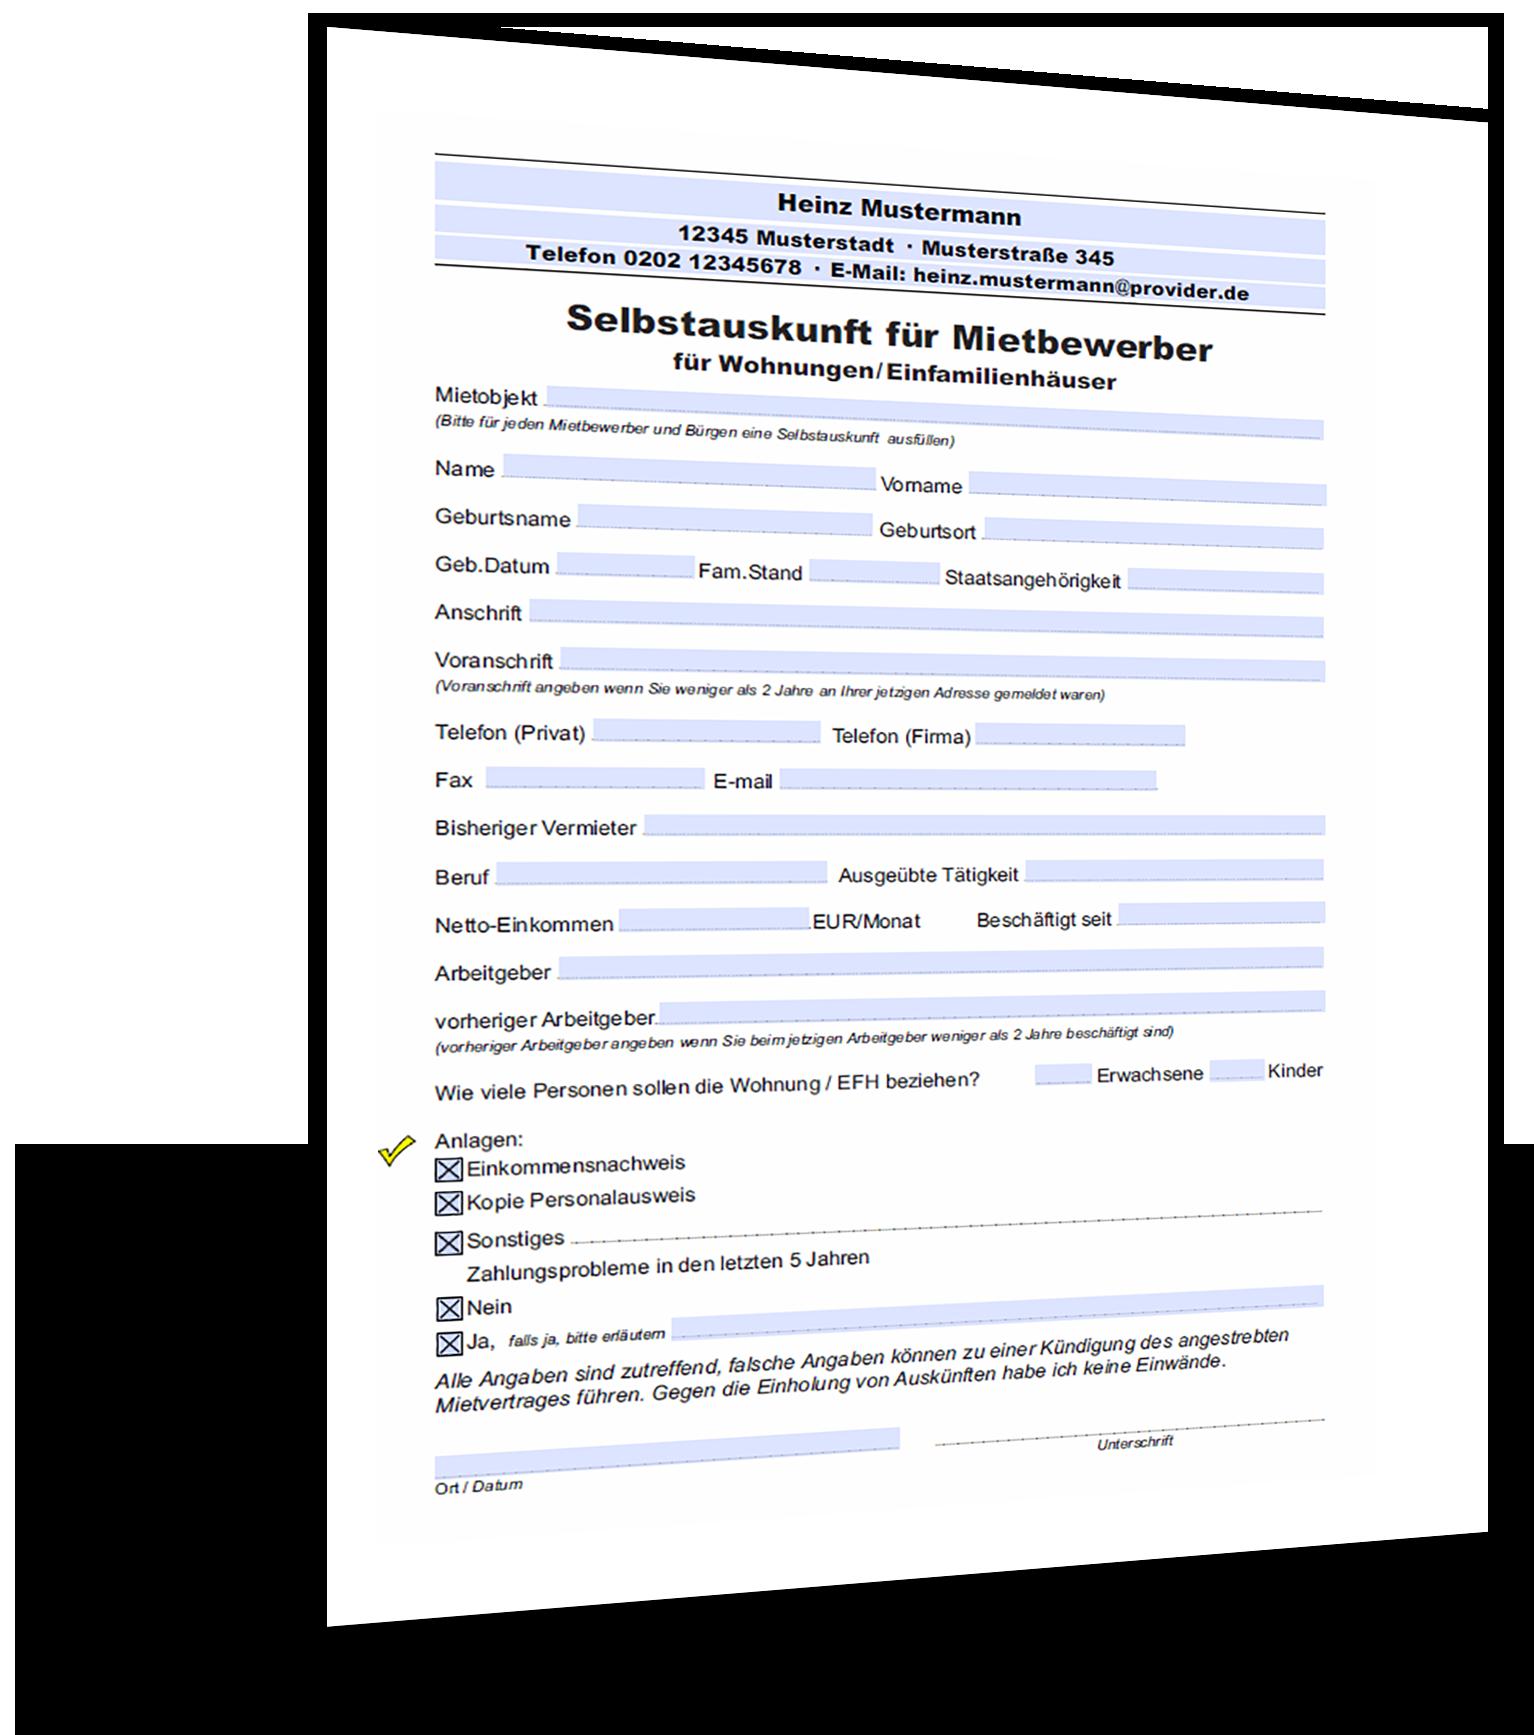 Selbstauskunft Fur Mietbewerber Muster Gratis Download